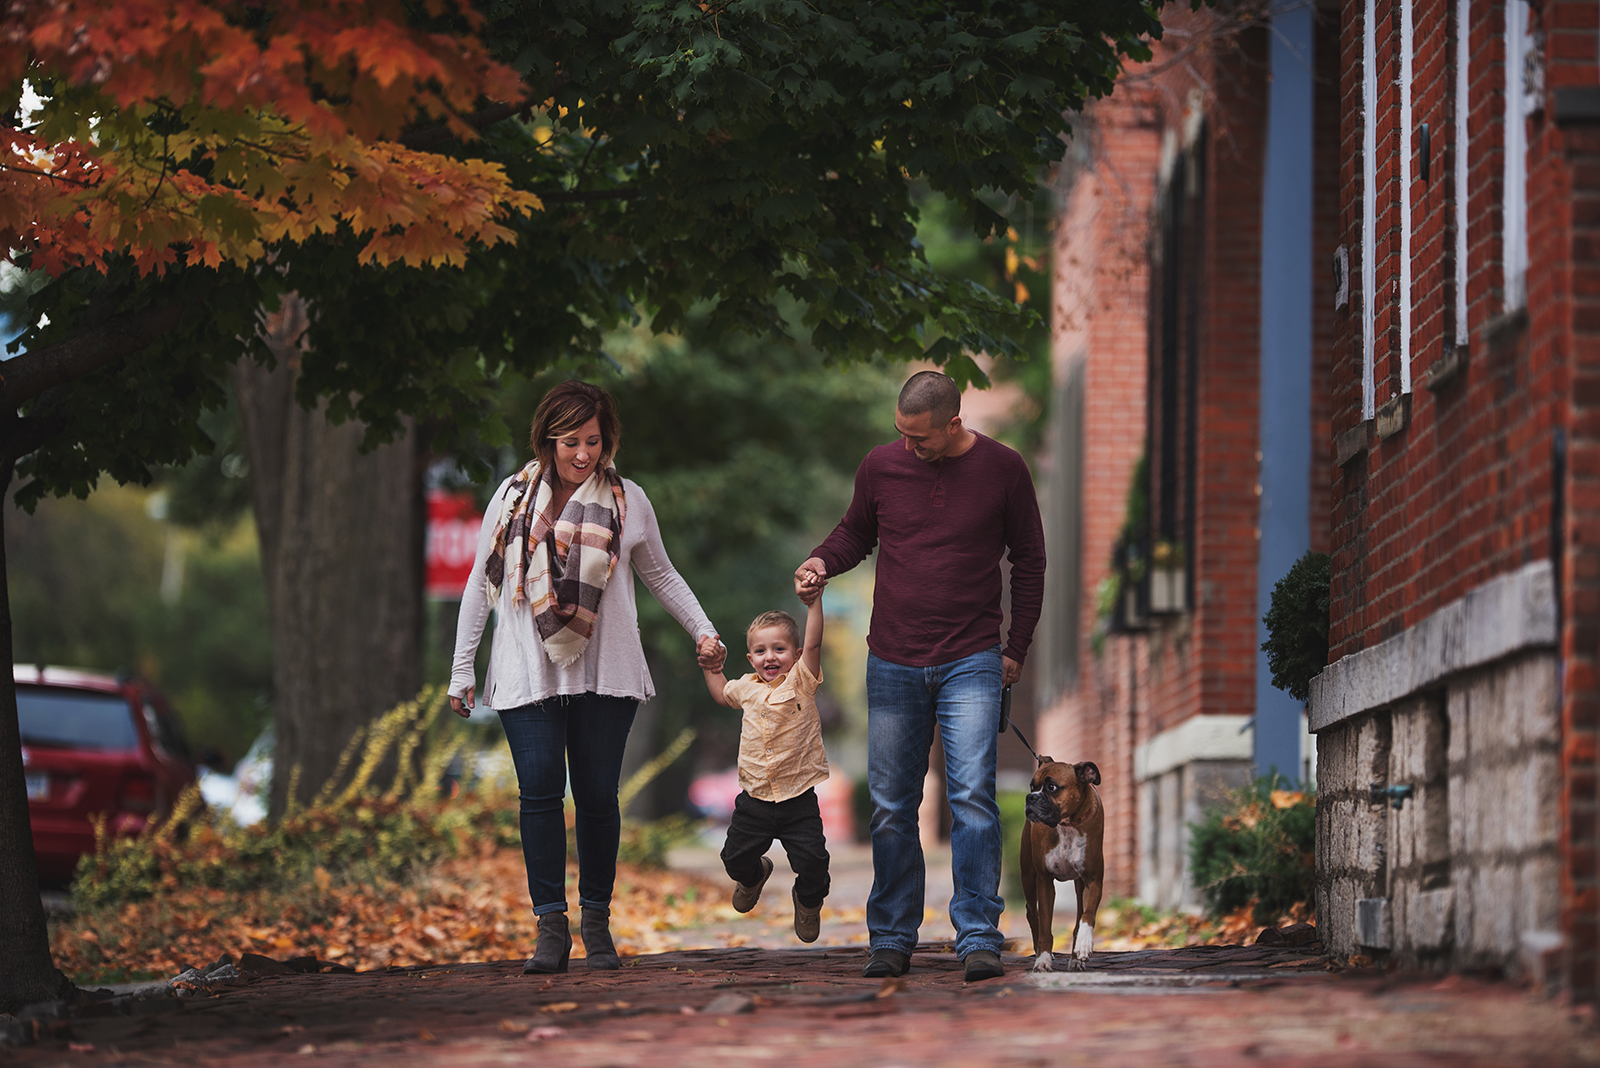 family-swinging-small-boy-on-sidewalk-family-posing-kellie-bieser-14-Milhoan